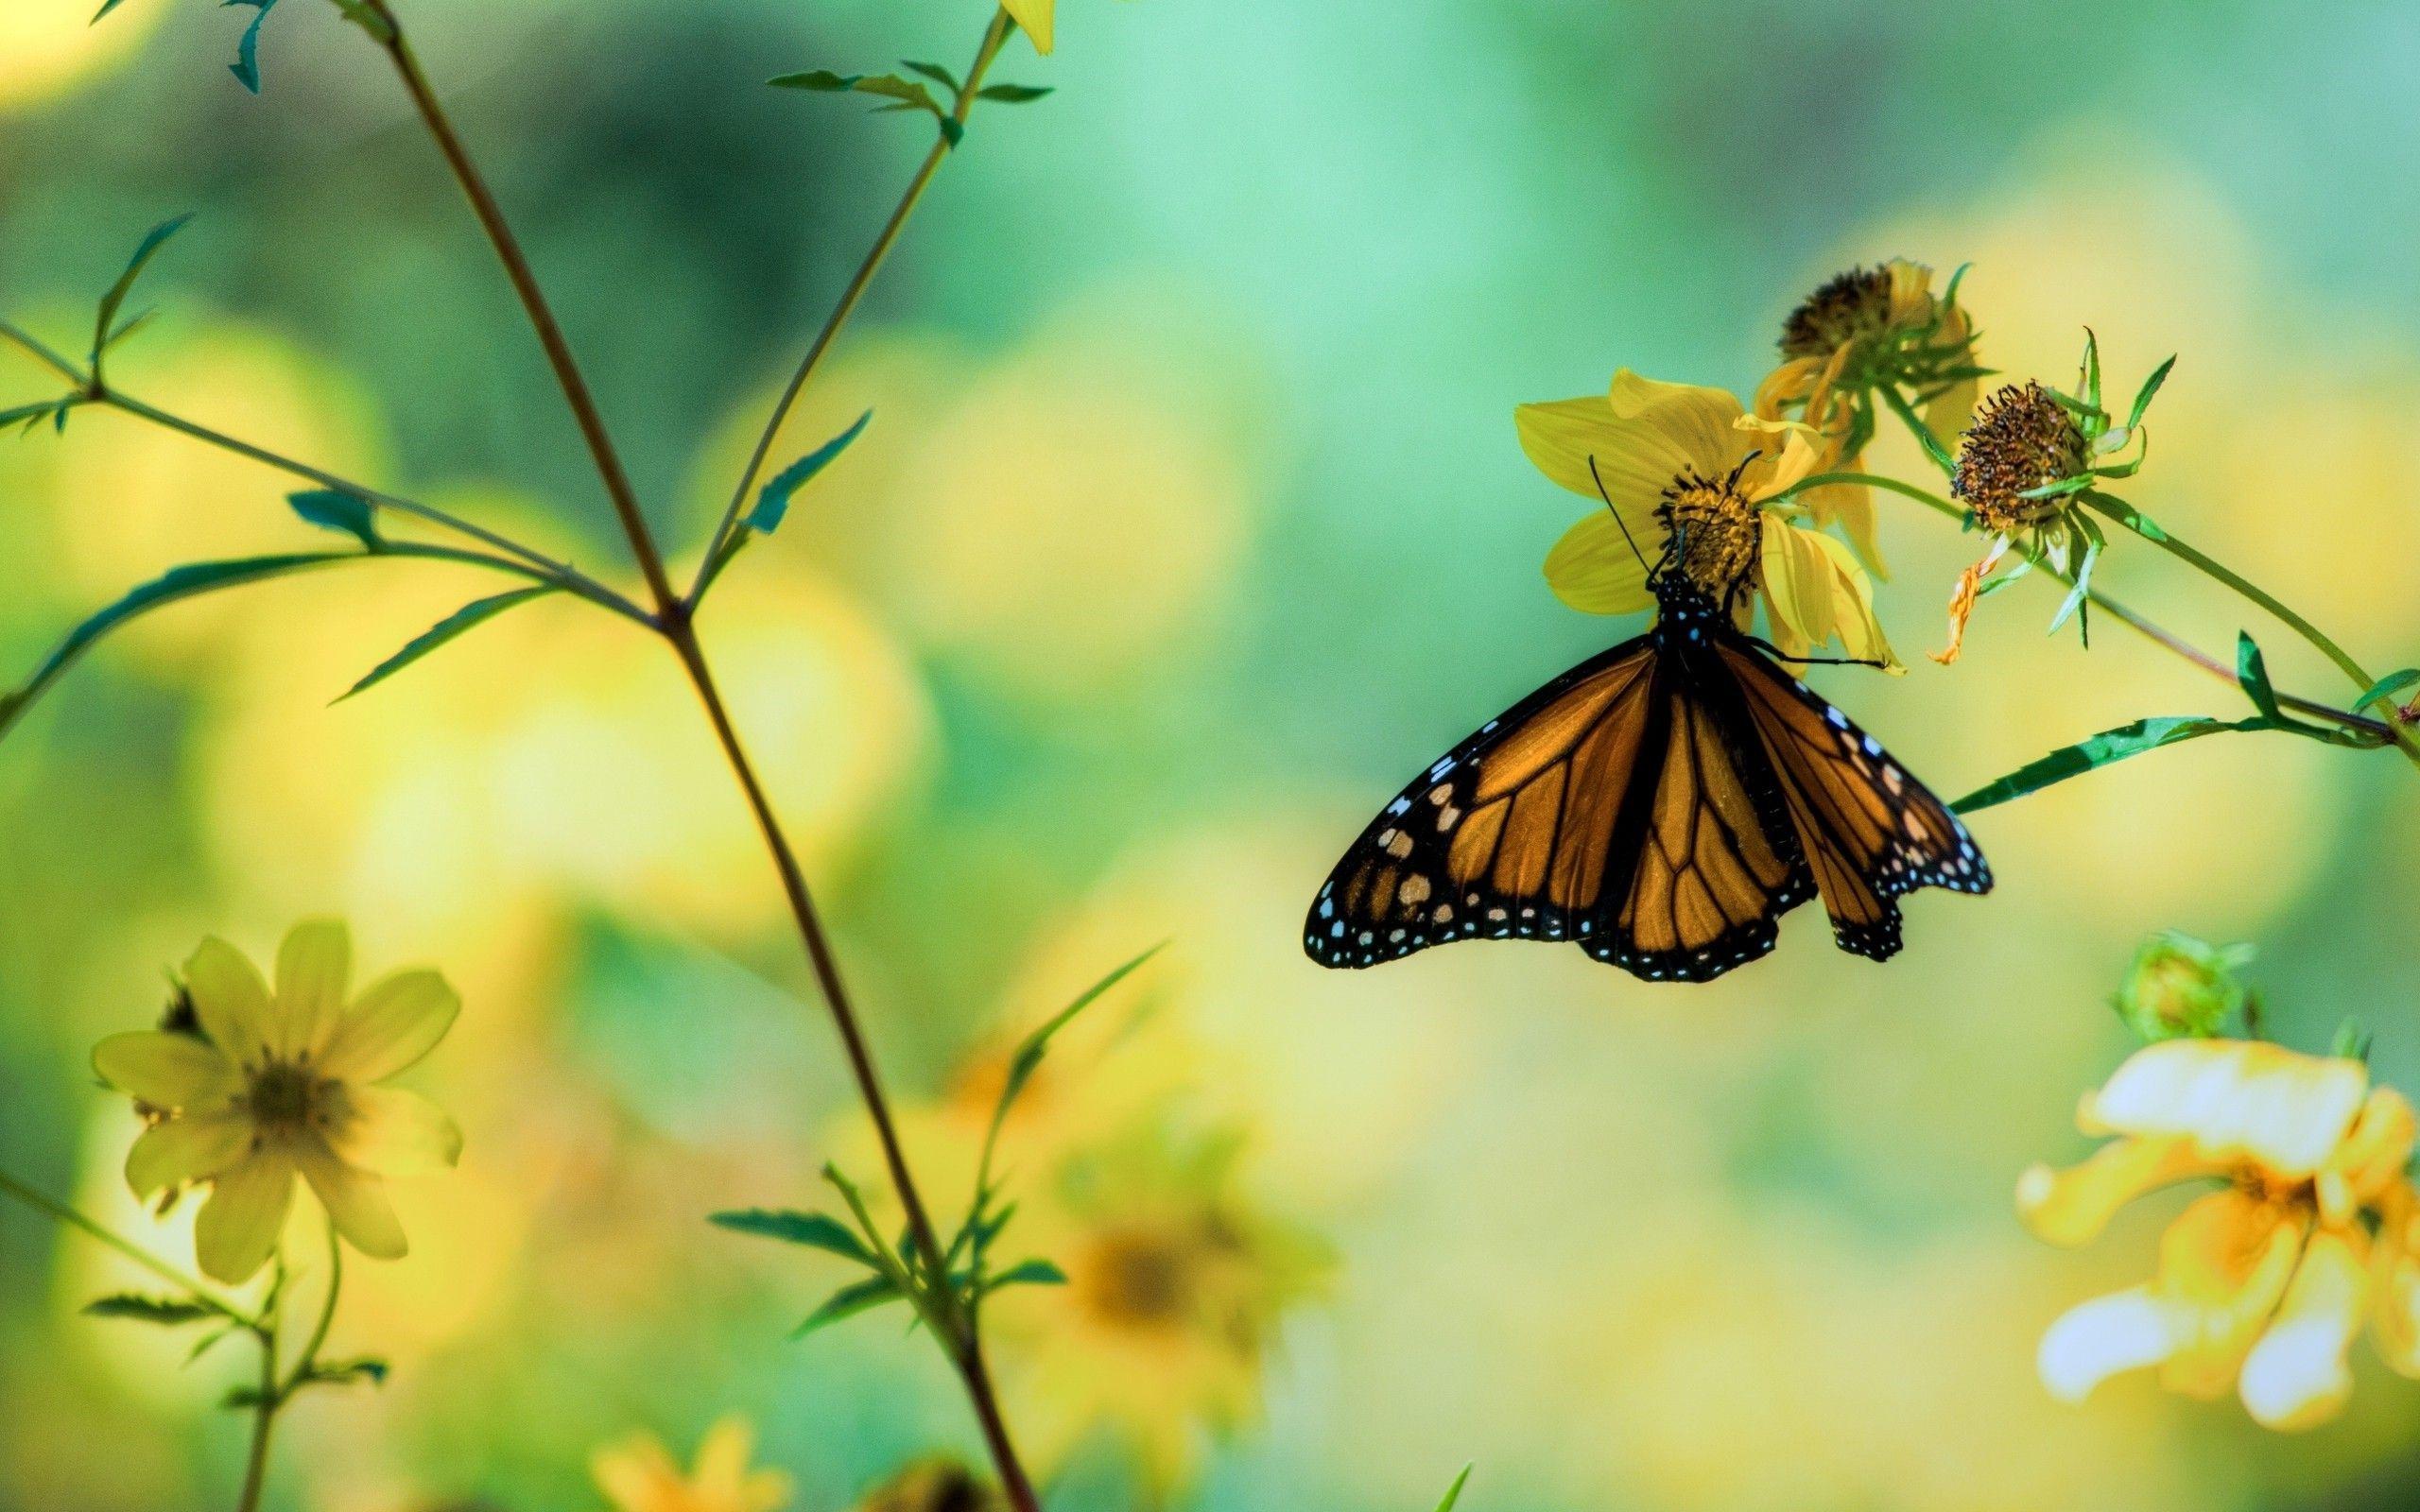 Butterfly Garden 4K Wallpapers